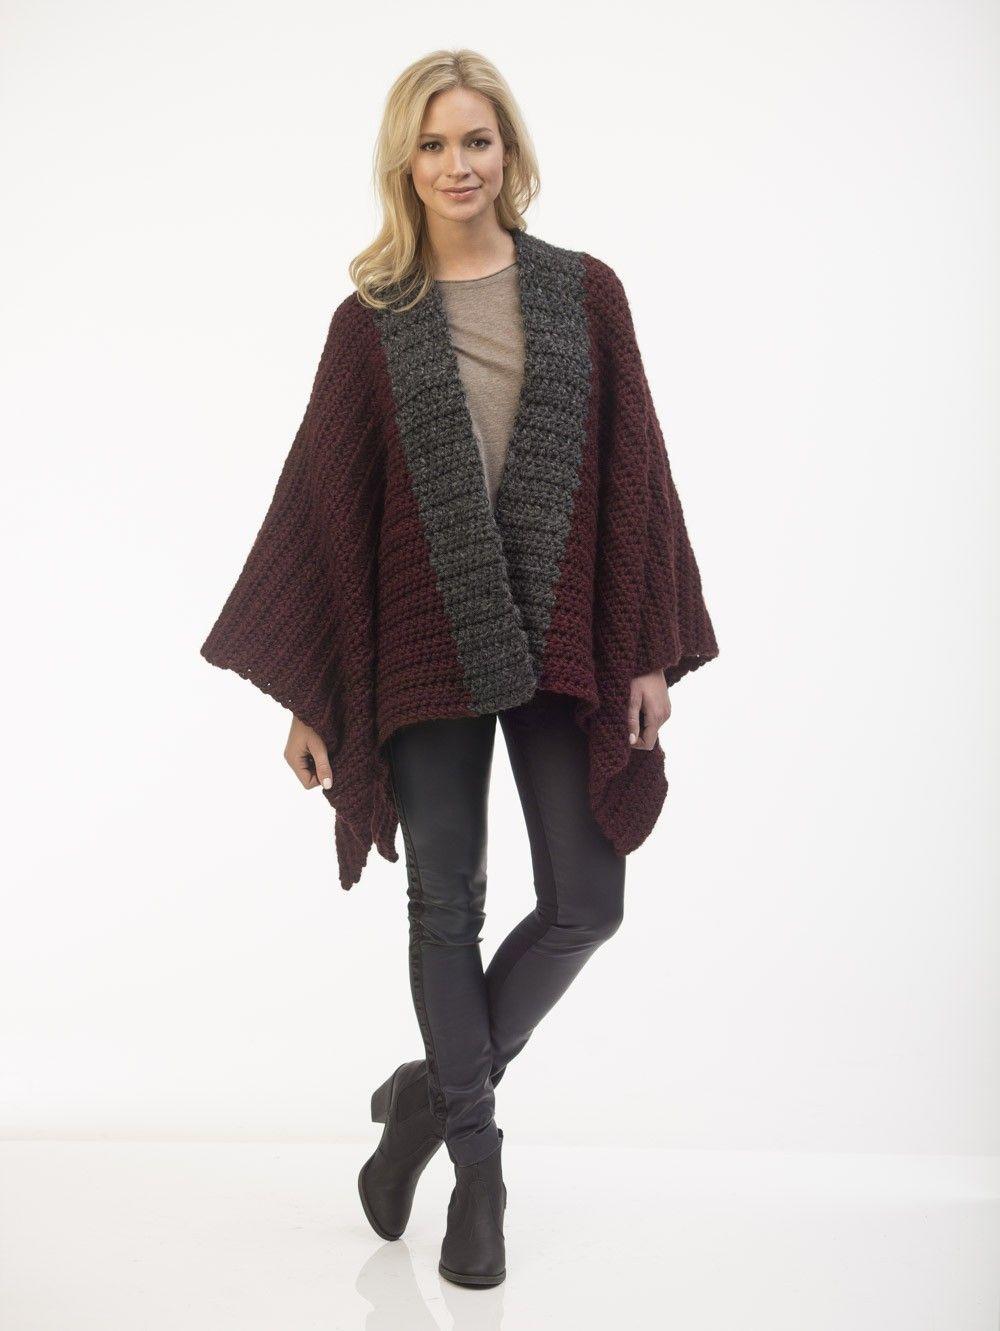 Carrington Poncho   crochet & knit clothing   Pinterest   Ponchos ...